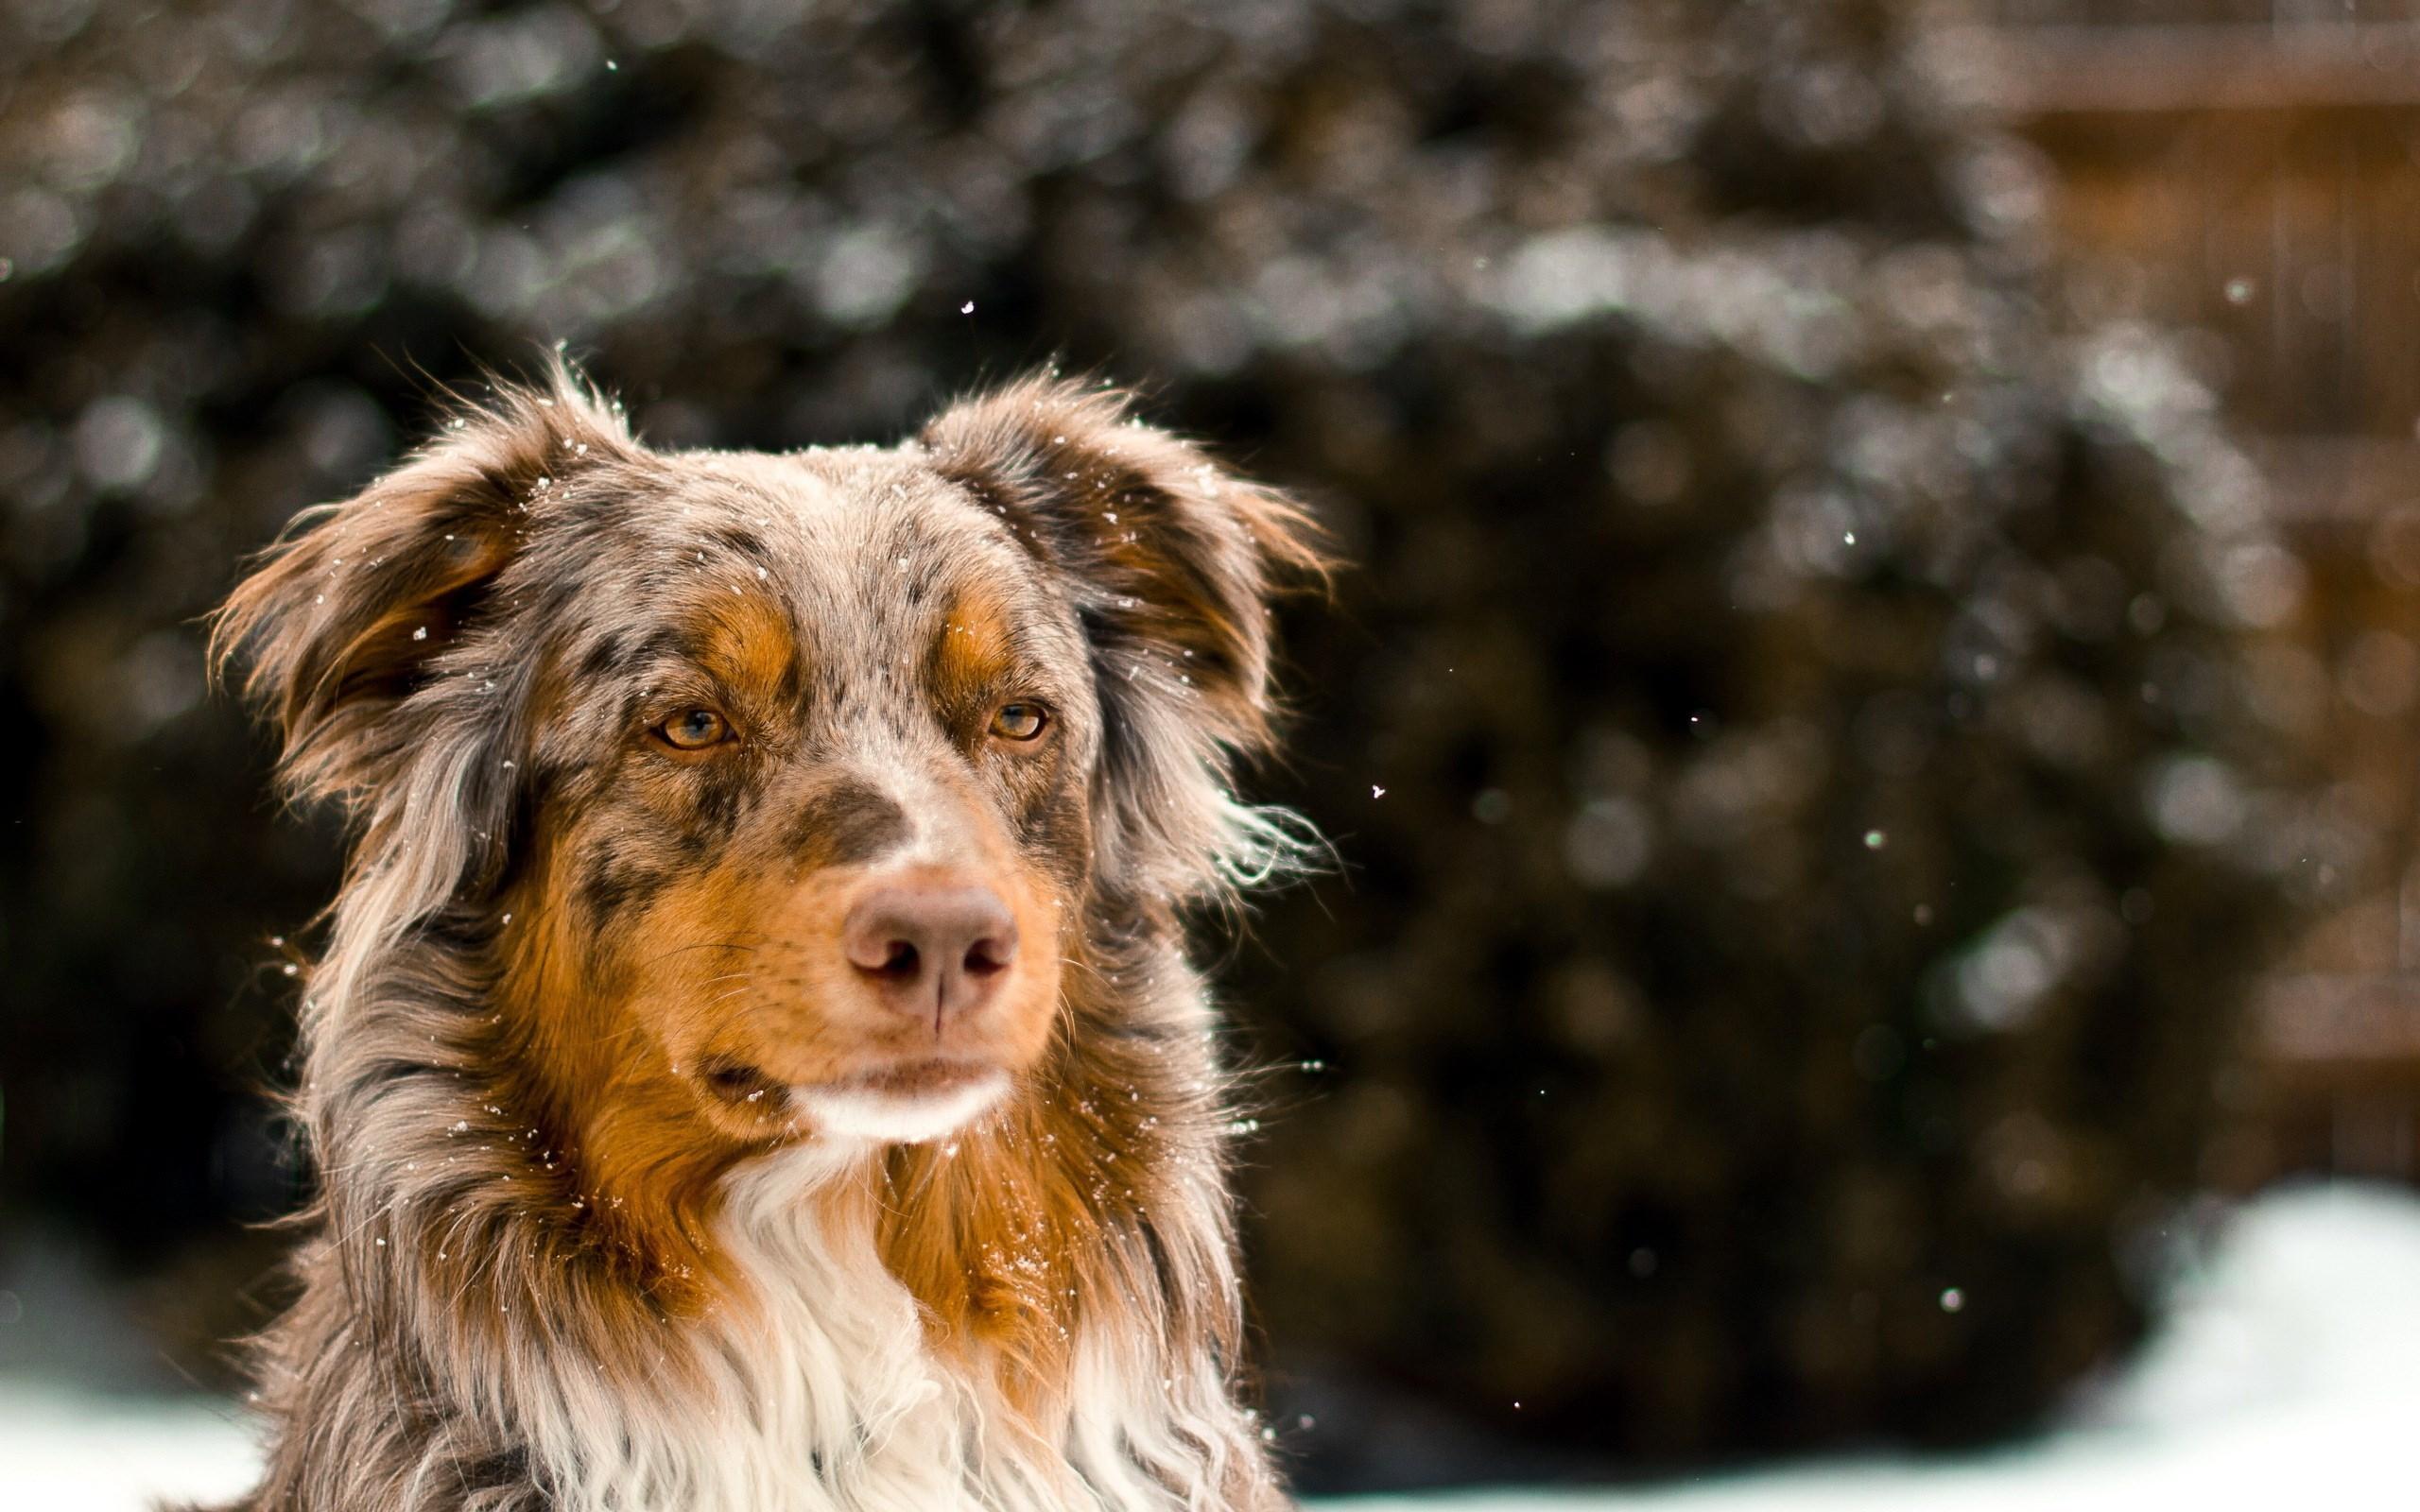 Dogs Winter Wallpaper   Wallpaper High Definition High Quality 2560x1600